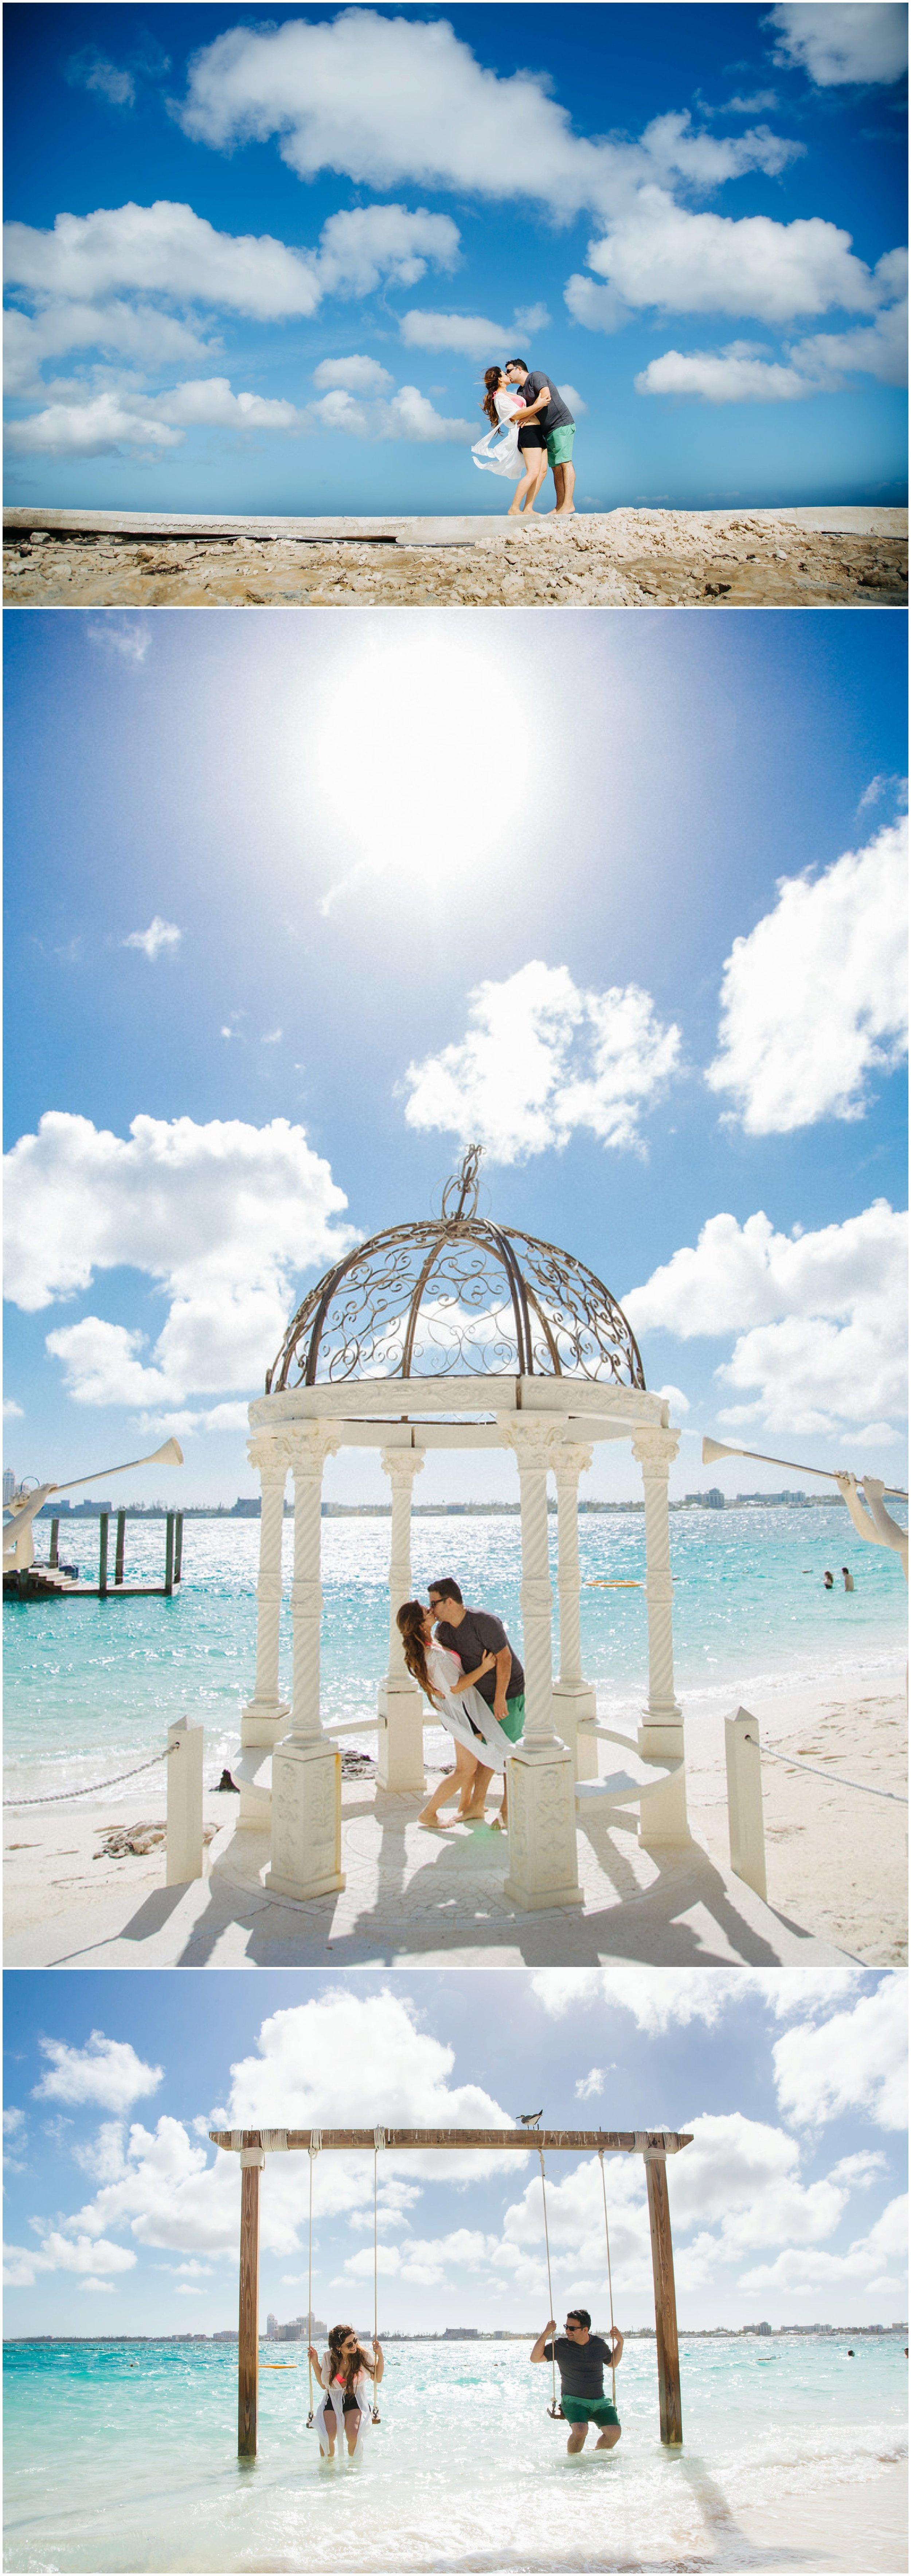 Le Cape Weddings- Destination Wedding Photography -ShayanandNikkie-814-X3_LuxuryDestinationPhotographer.jpg